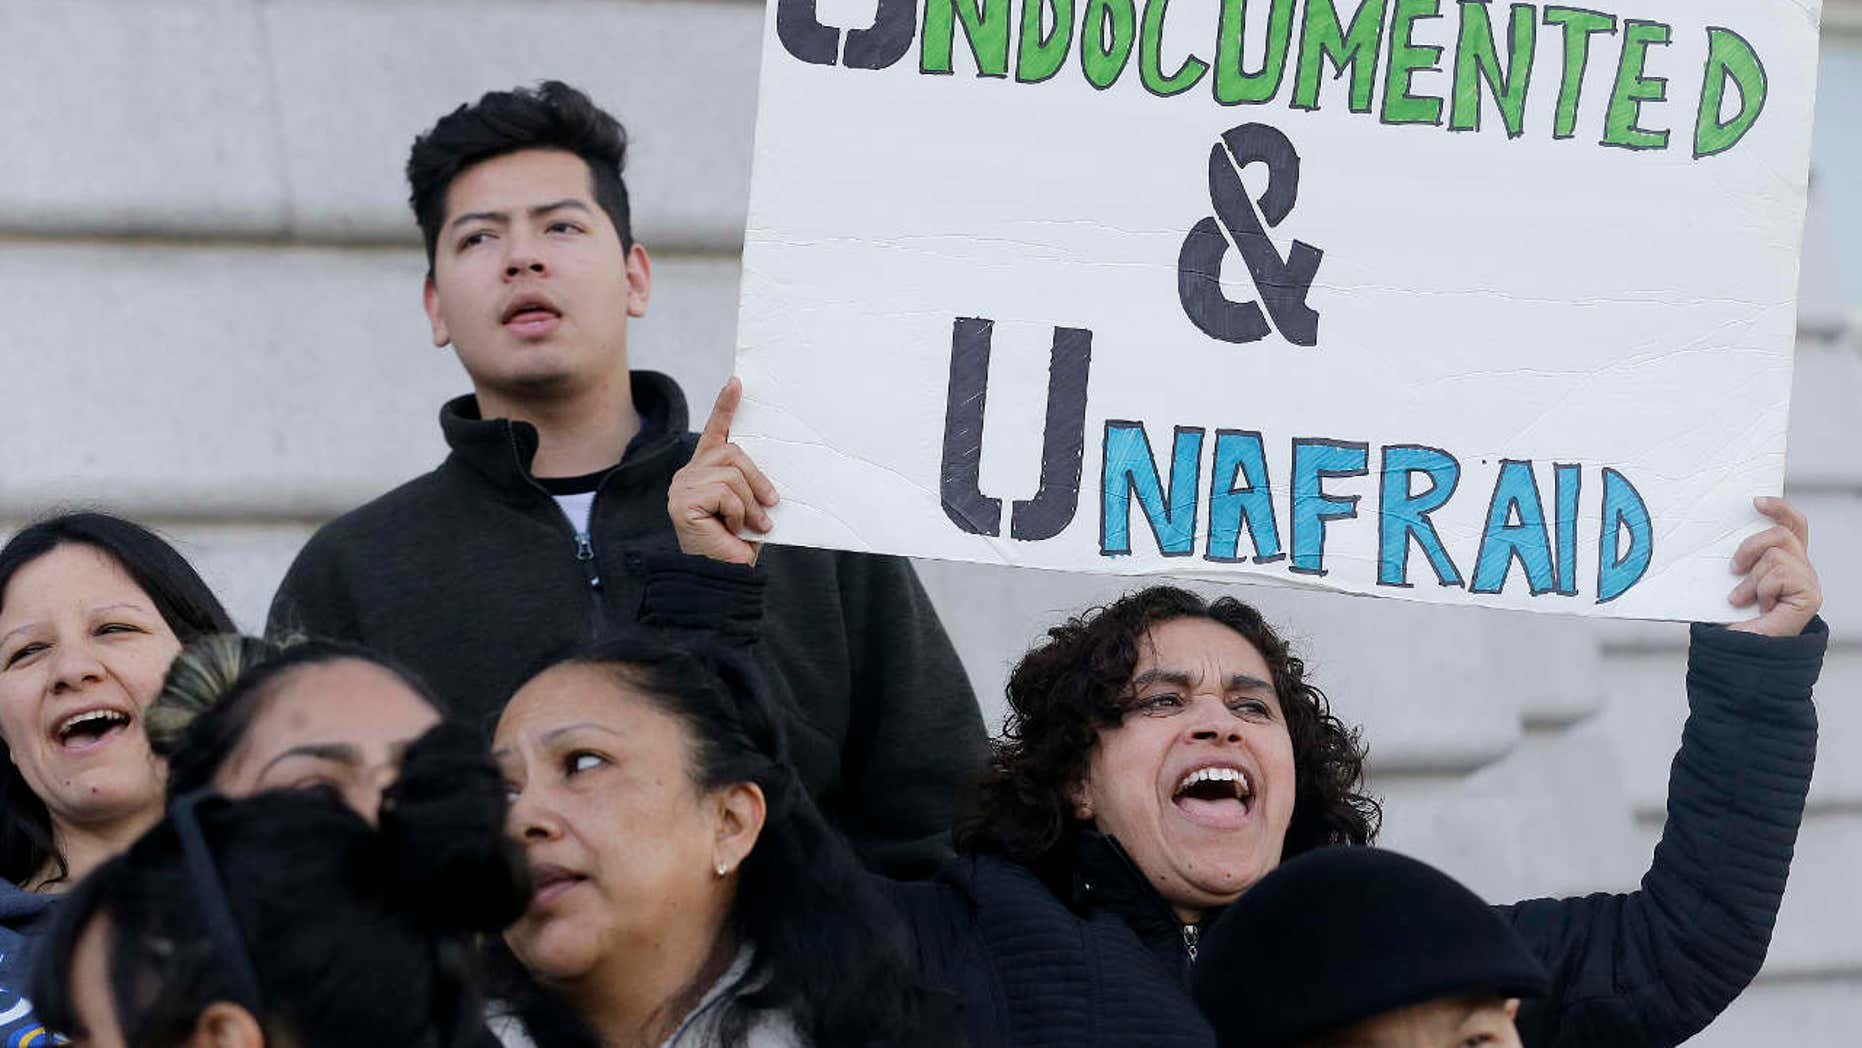 Jan. 25, 2017: Lordes Reboyoso, right, yells at a rally outside of City Hall in San Francisco.